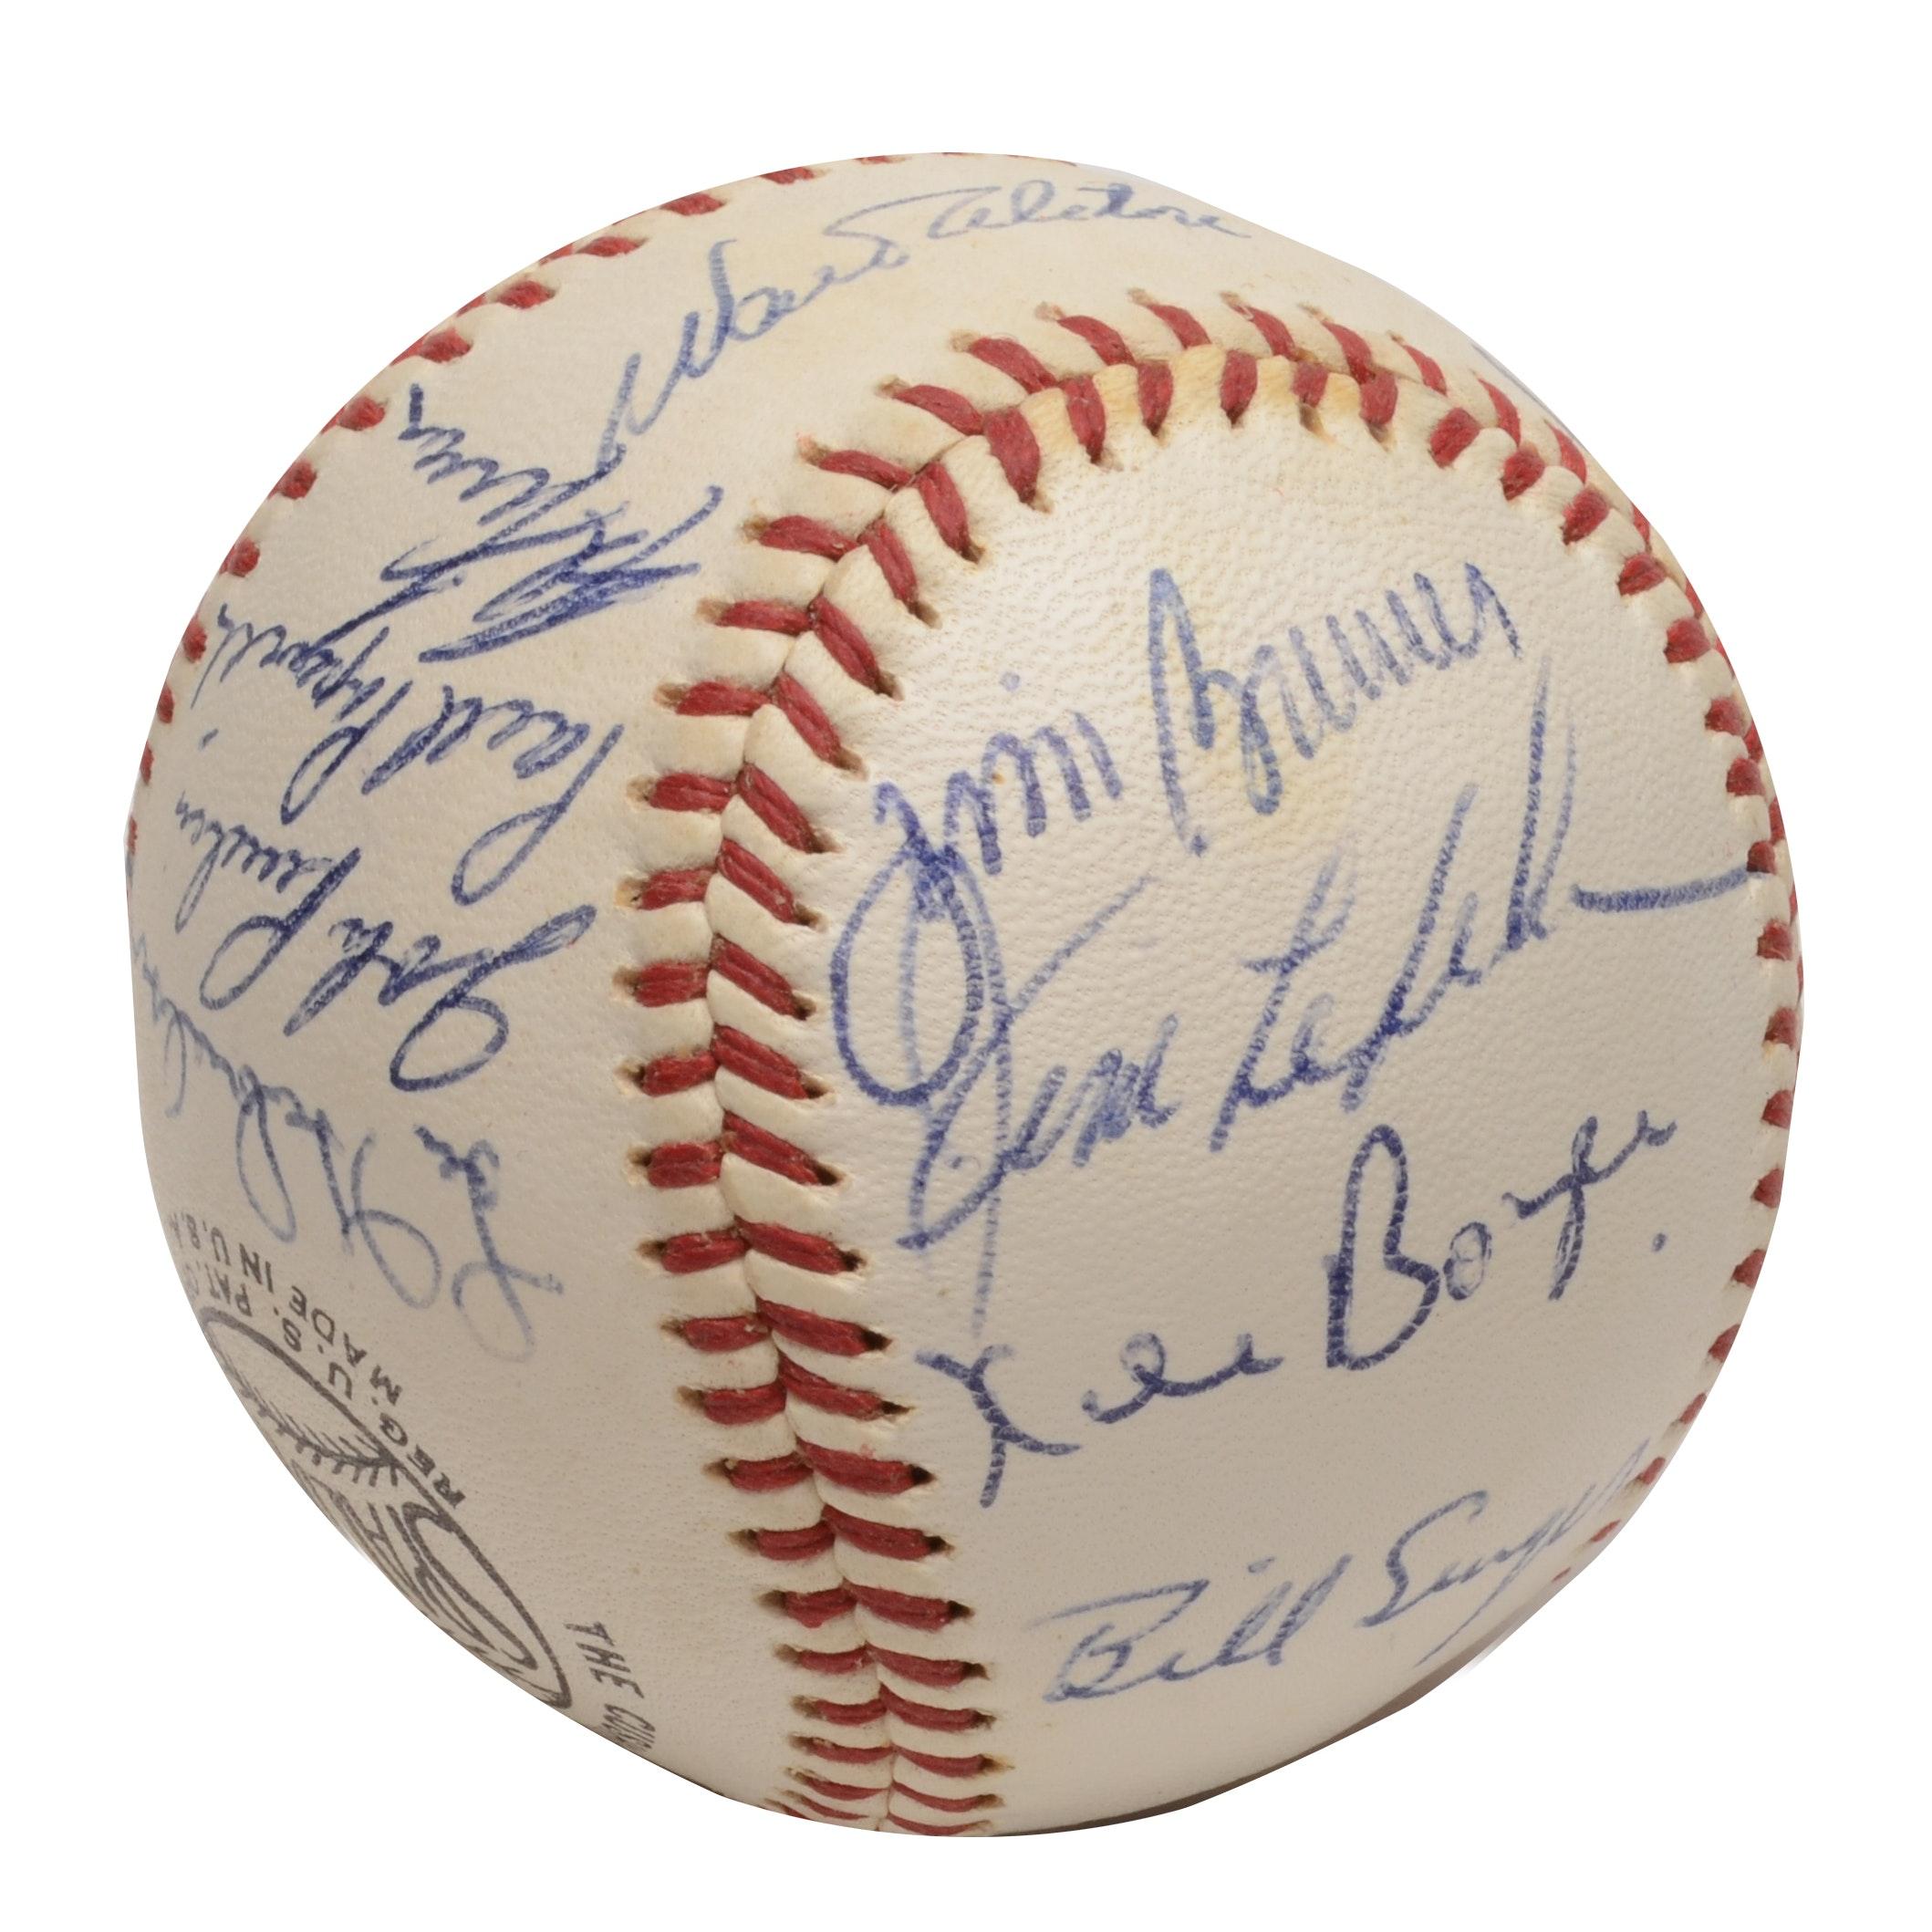 1968/69 Dodgers Autographed Baseball